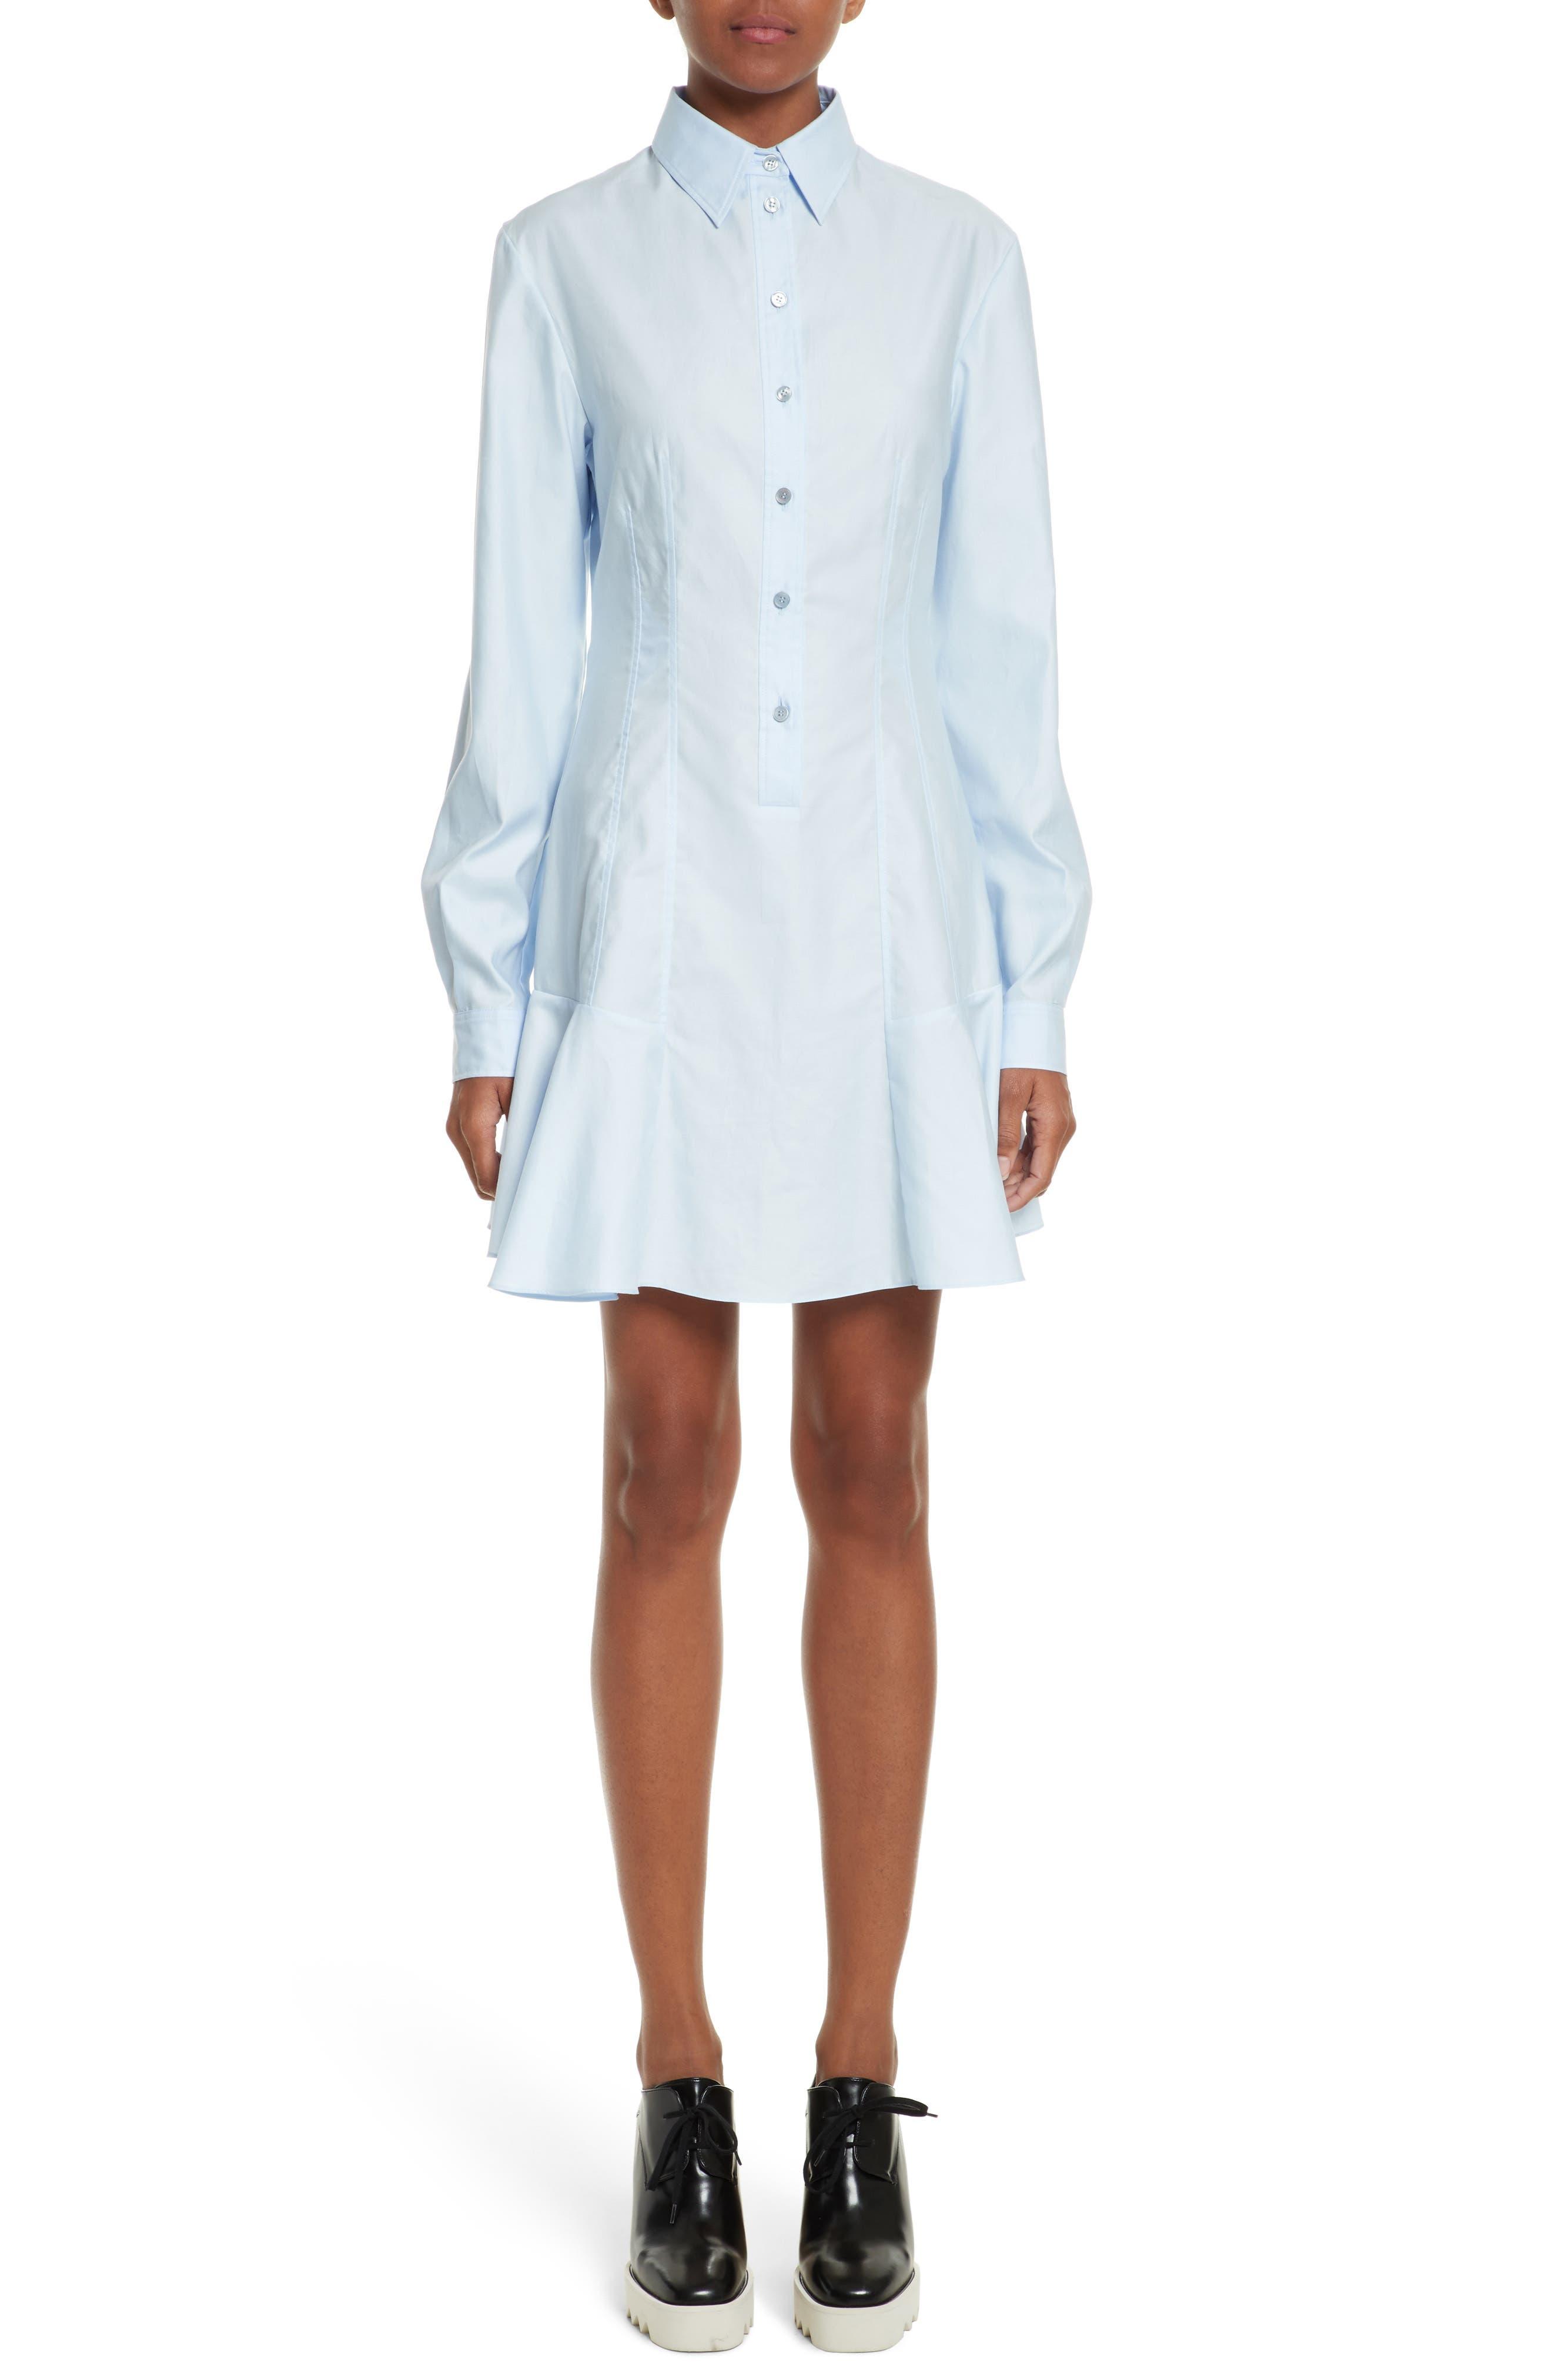 Alternate Image 1 Selected - Stella McCartney Carina Cotton Poplin Shirtdress